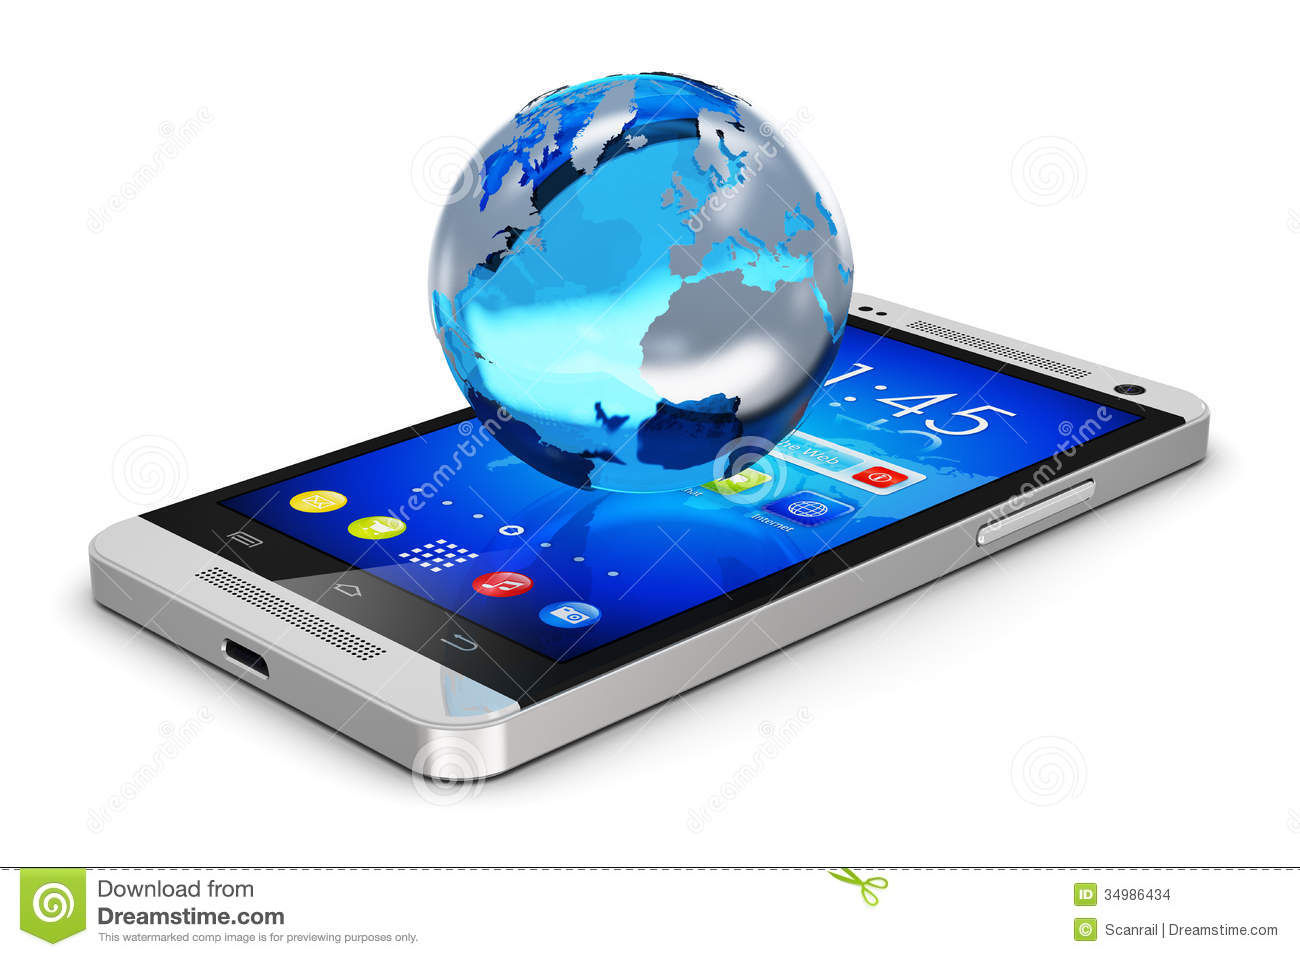 Cara Merawat Smartphone Non-Removable Battery video viral info traveling info teknologi info seks info properti info kuliner info kesehatan foto viral berita ekonomi